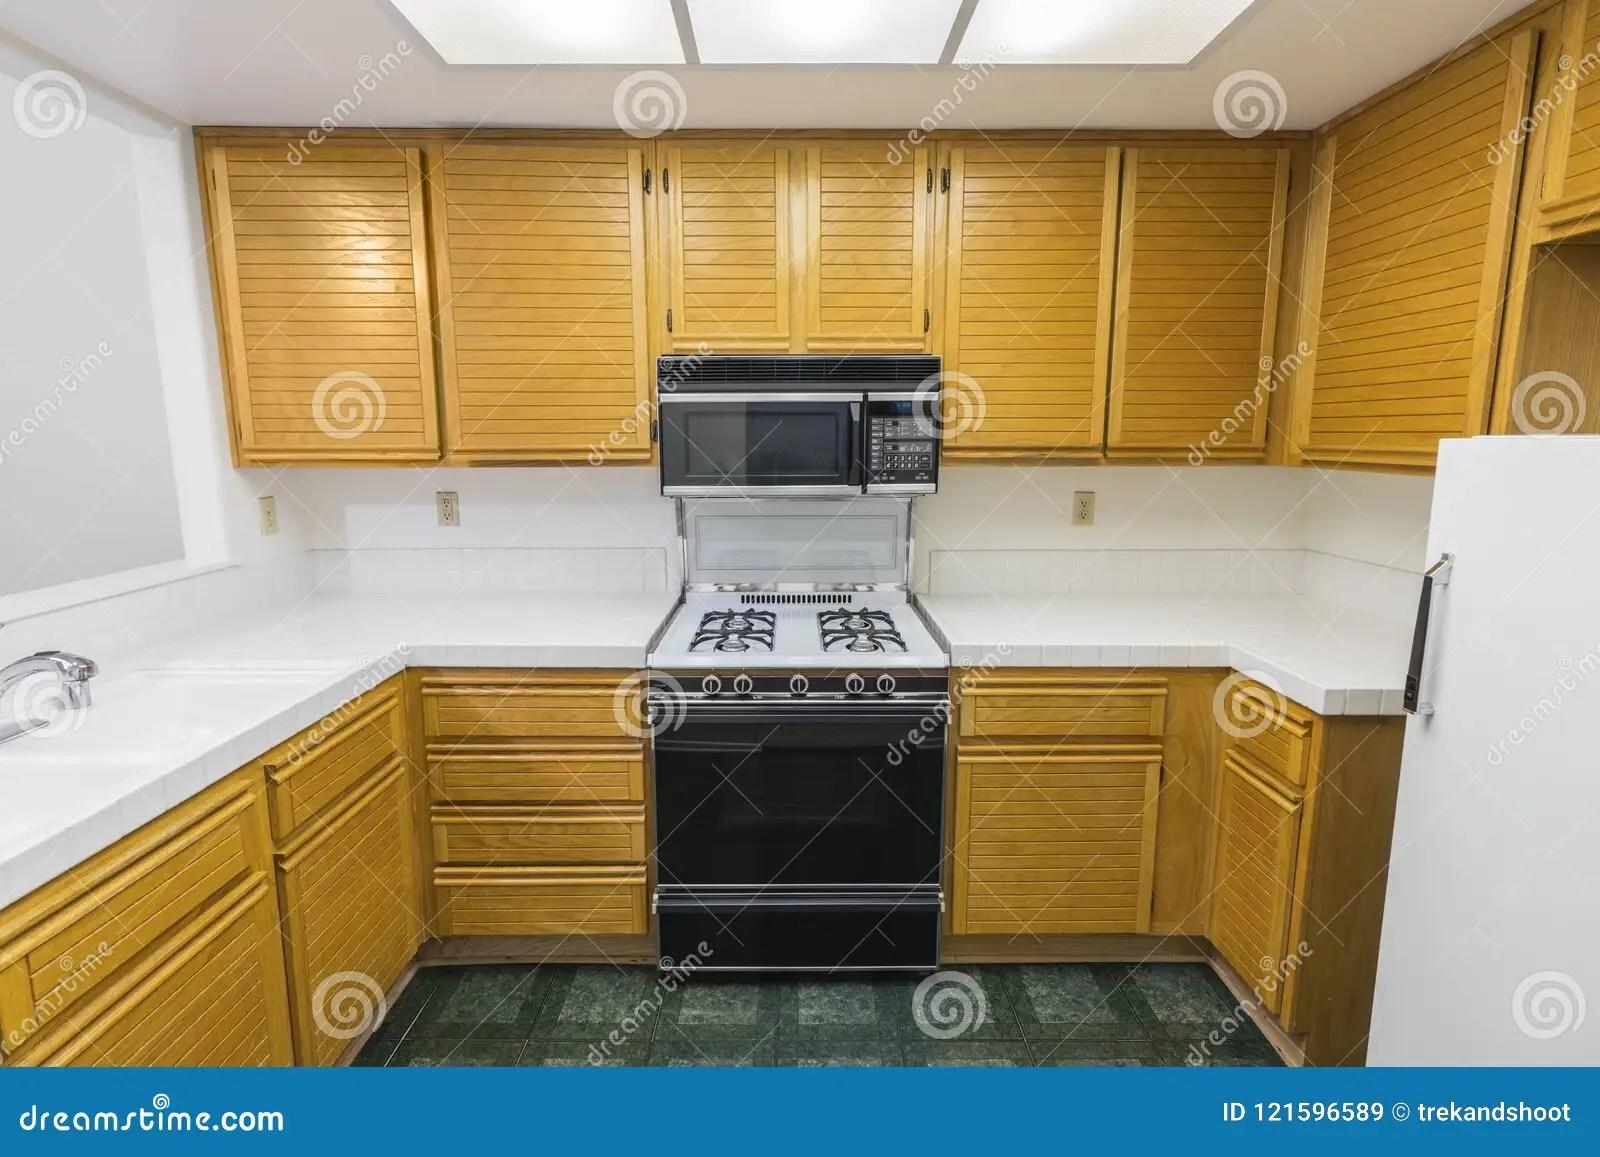 kitchen vinyl flooring cabinets wall mounted 老公寓房厨房库存图片 图片包括有中间 机柜 公寓房 减速火箭 便宜地 有橡木柜 瓦片工作台面 煤气炉和绿色乙烯基地板的老公寓房厨房未改变地自1988年以来